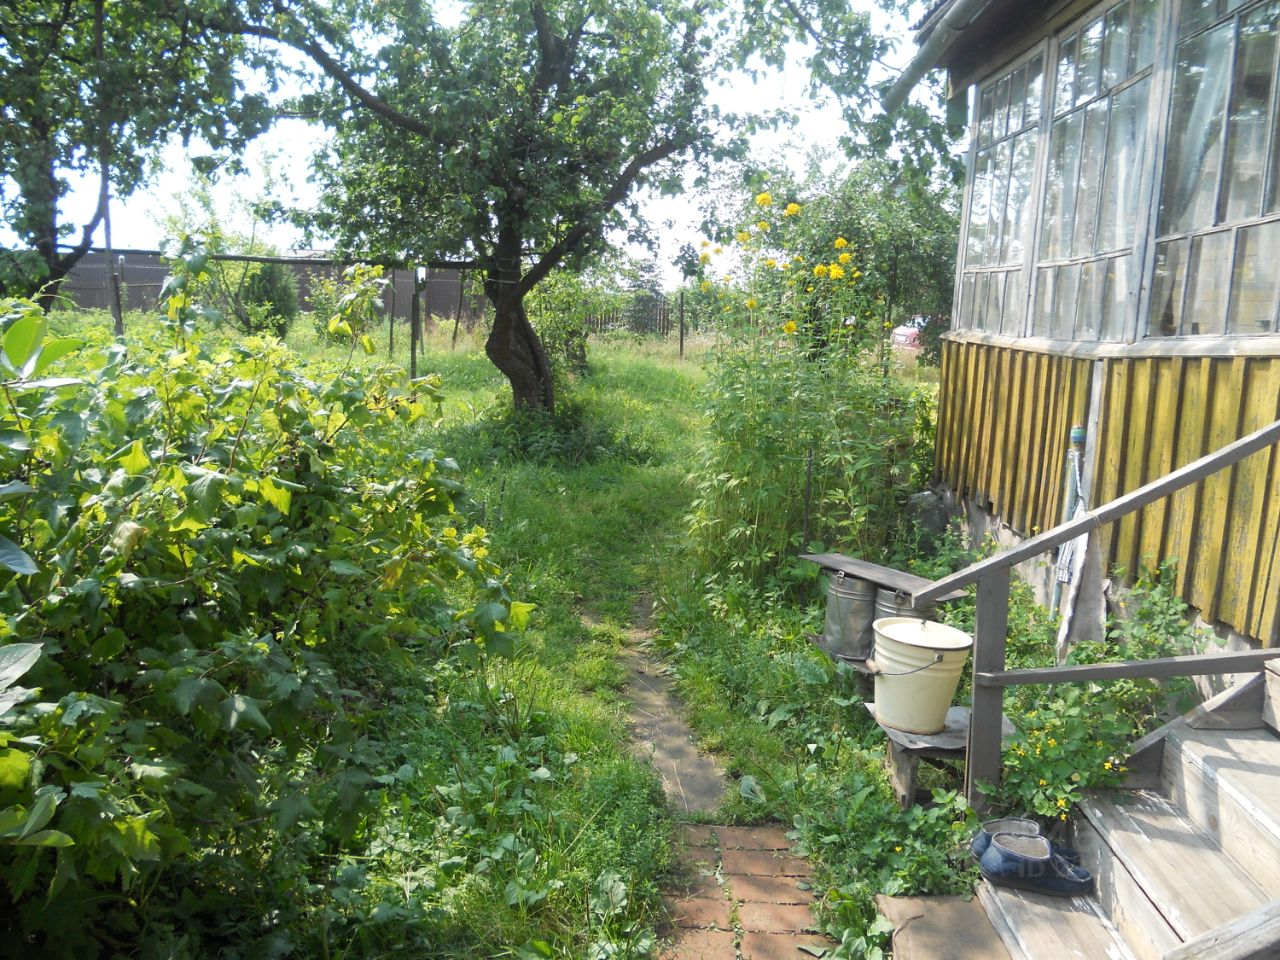 продам дом Щелковский район, деревня Здехово